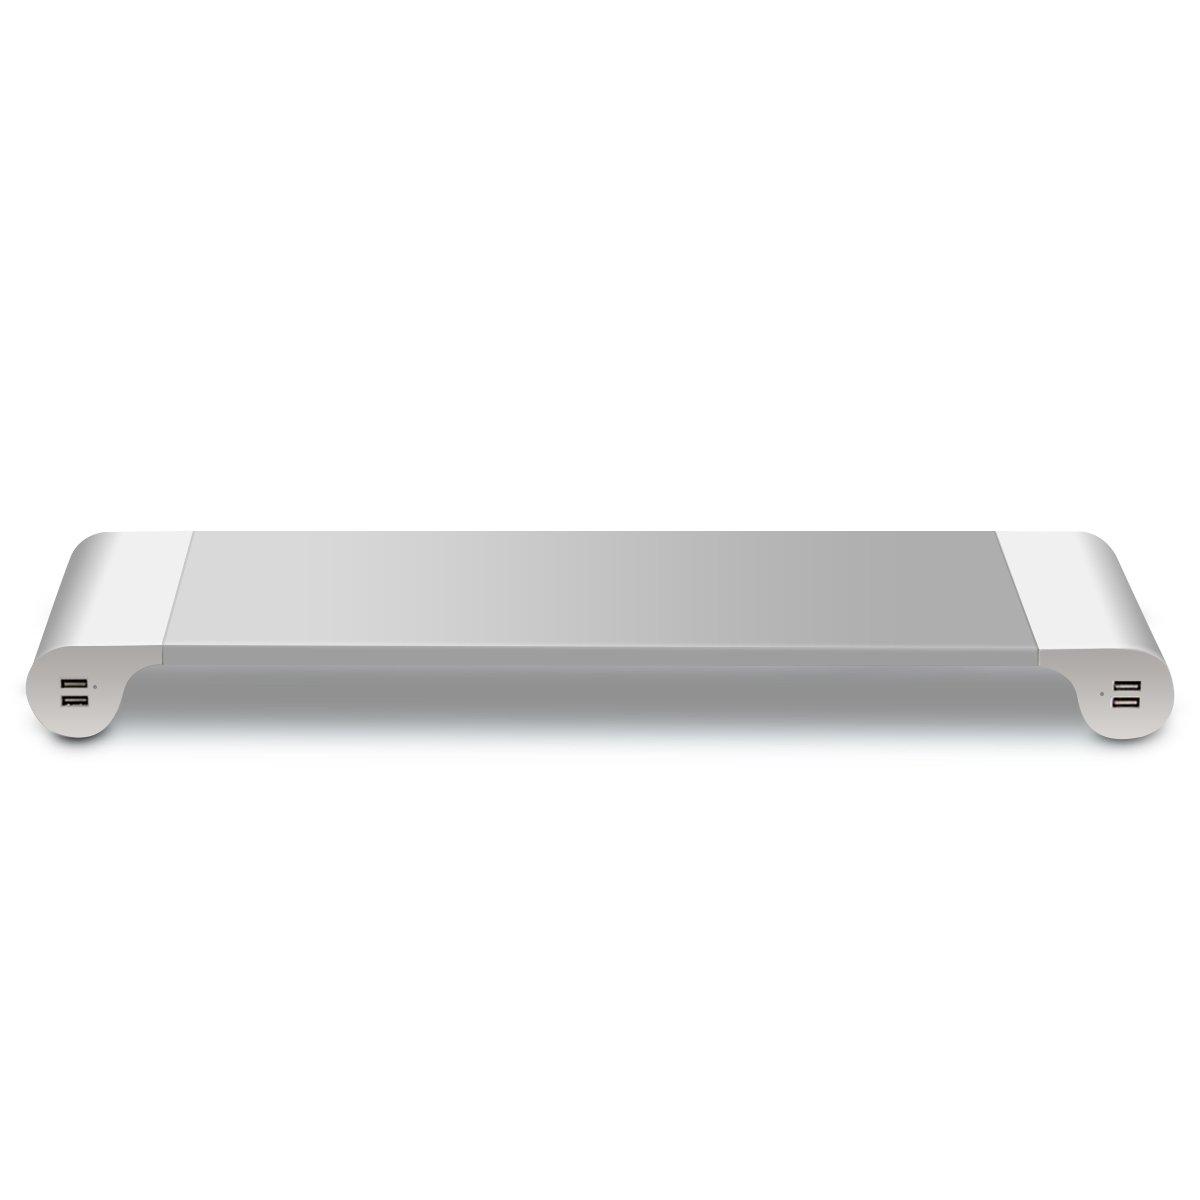 Base minimalista para portátil o monitor con puertos USB